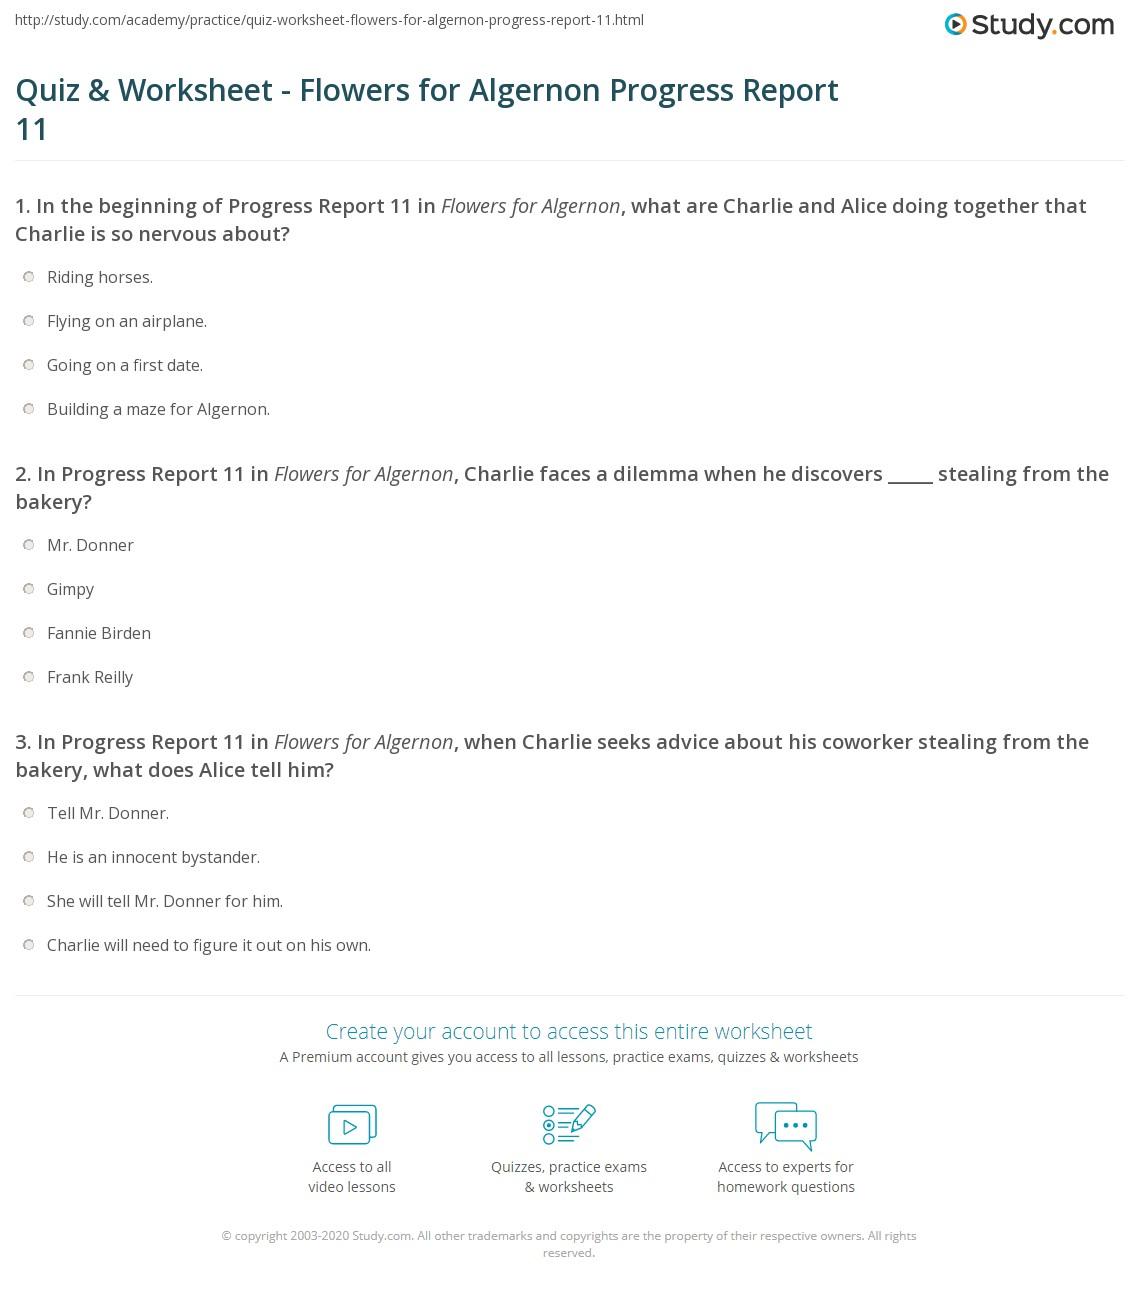 quiz worksheet flowers for algernon progress report com print flowers for algernon progress report 11 summary worksheet